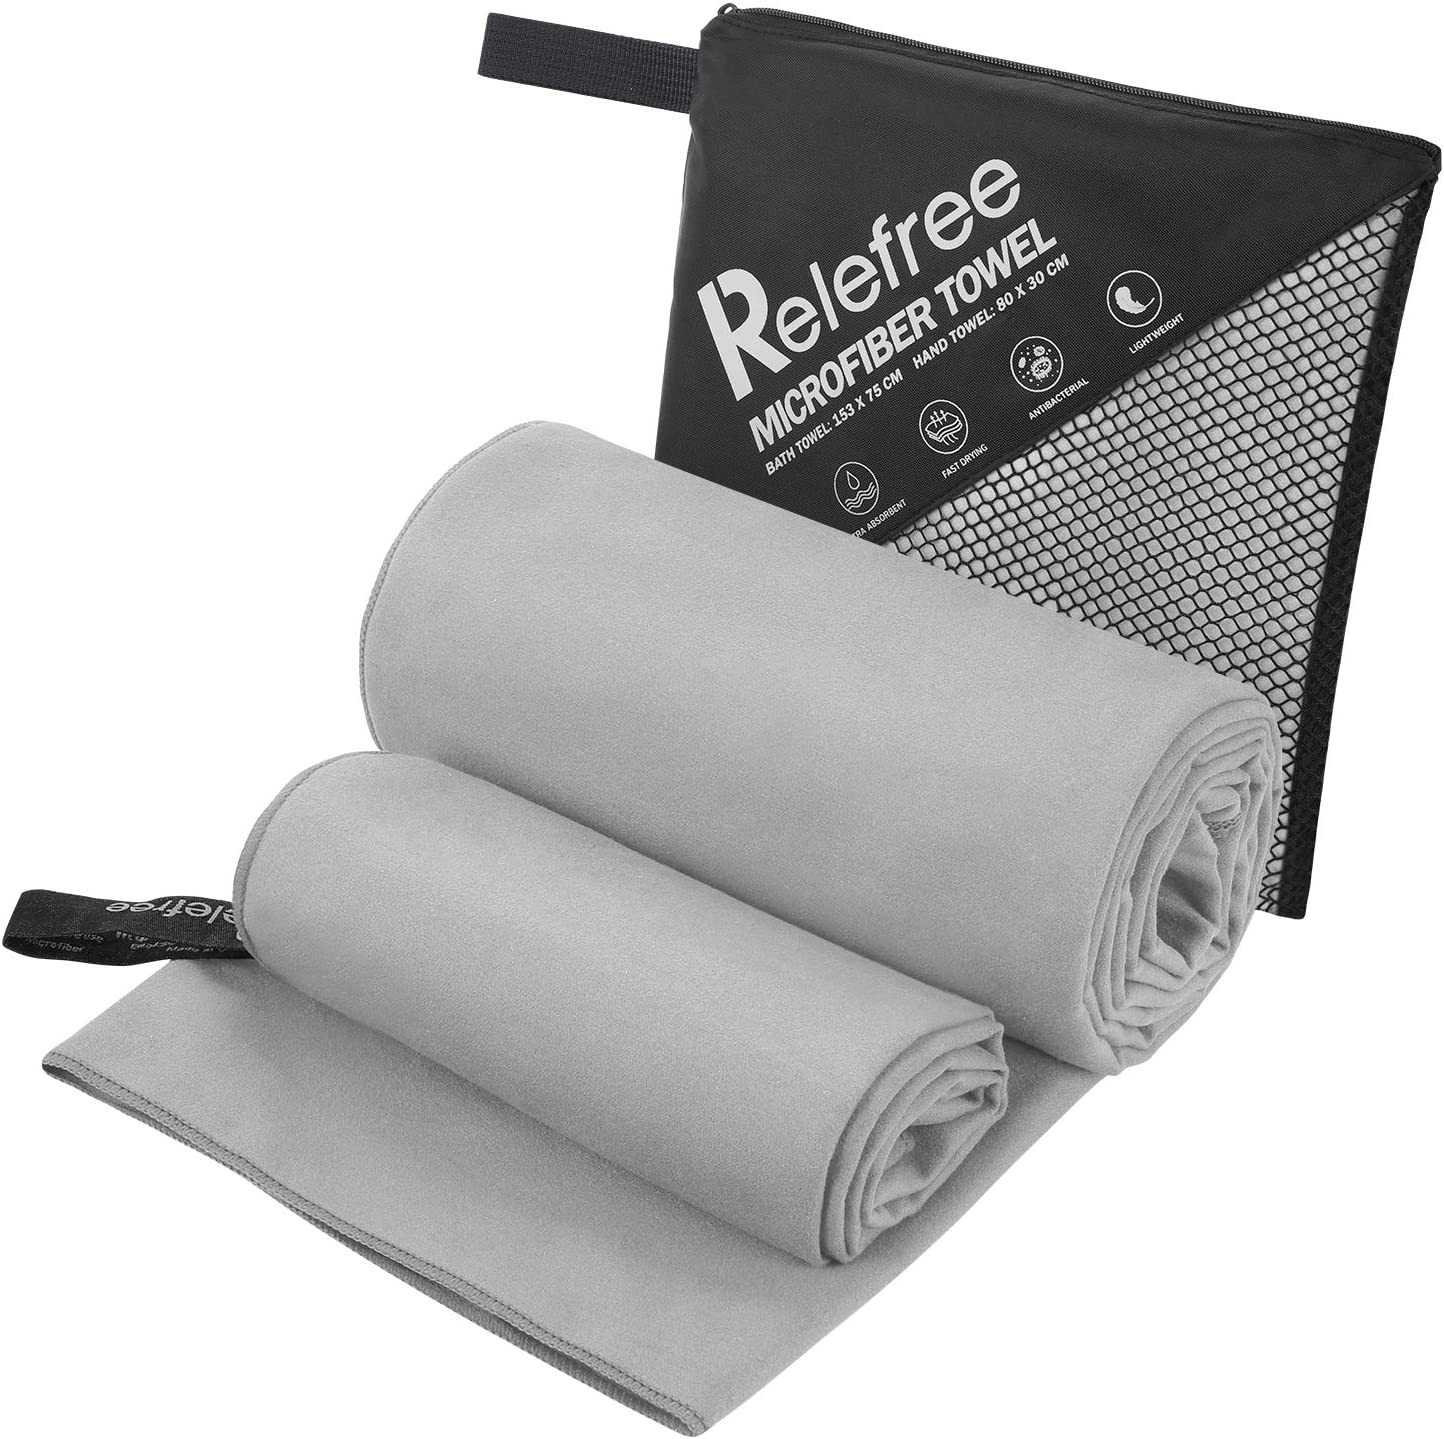 Relefree Microfiber Towel